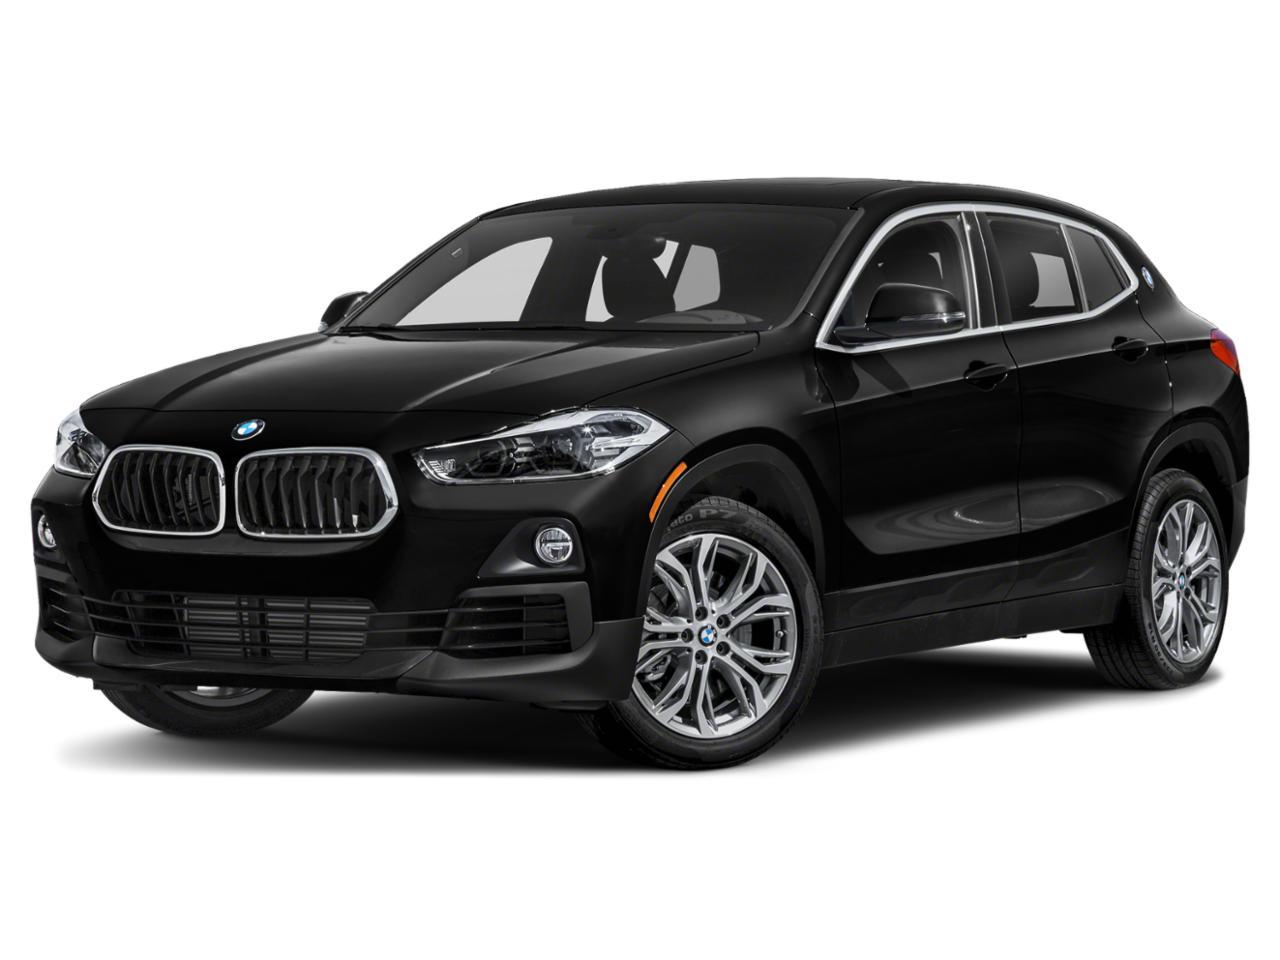 2022 BMW X2 sDrive28i Vehicle Photo in Grapevine, TX 76051